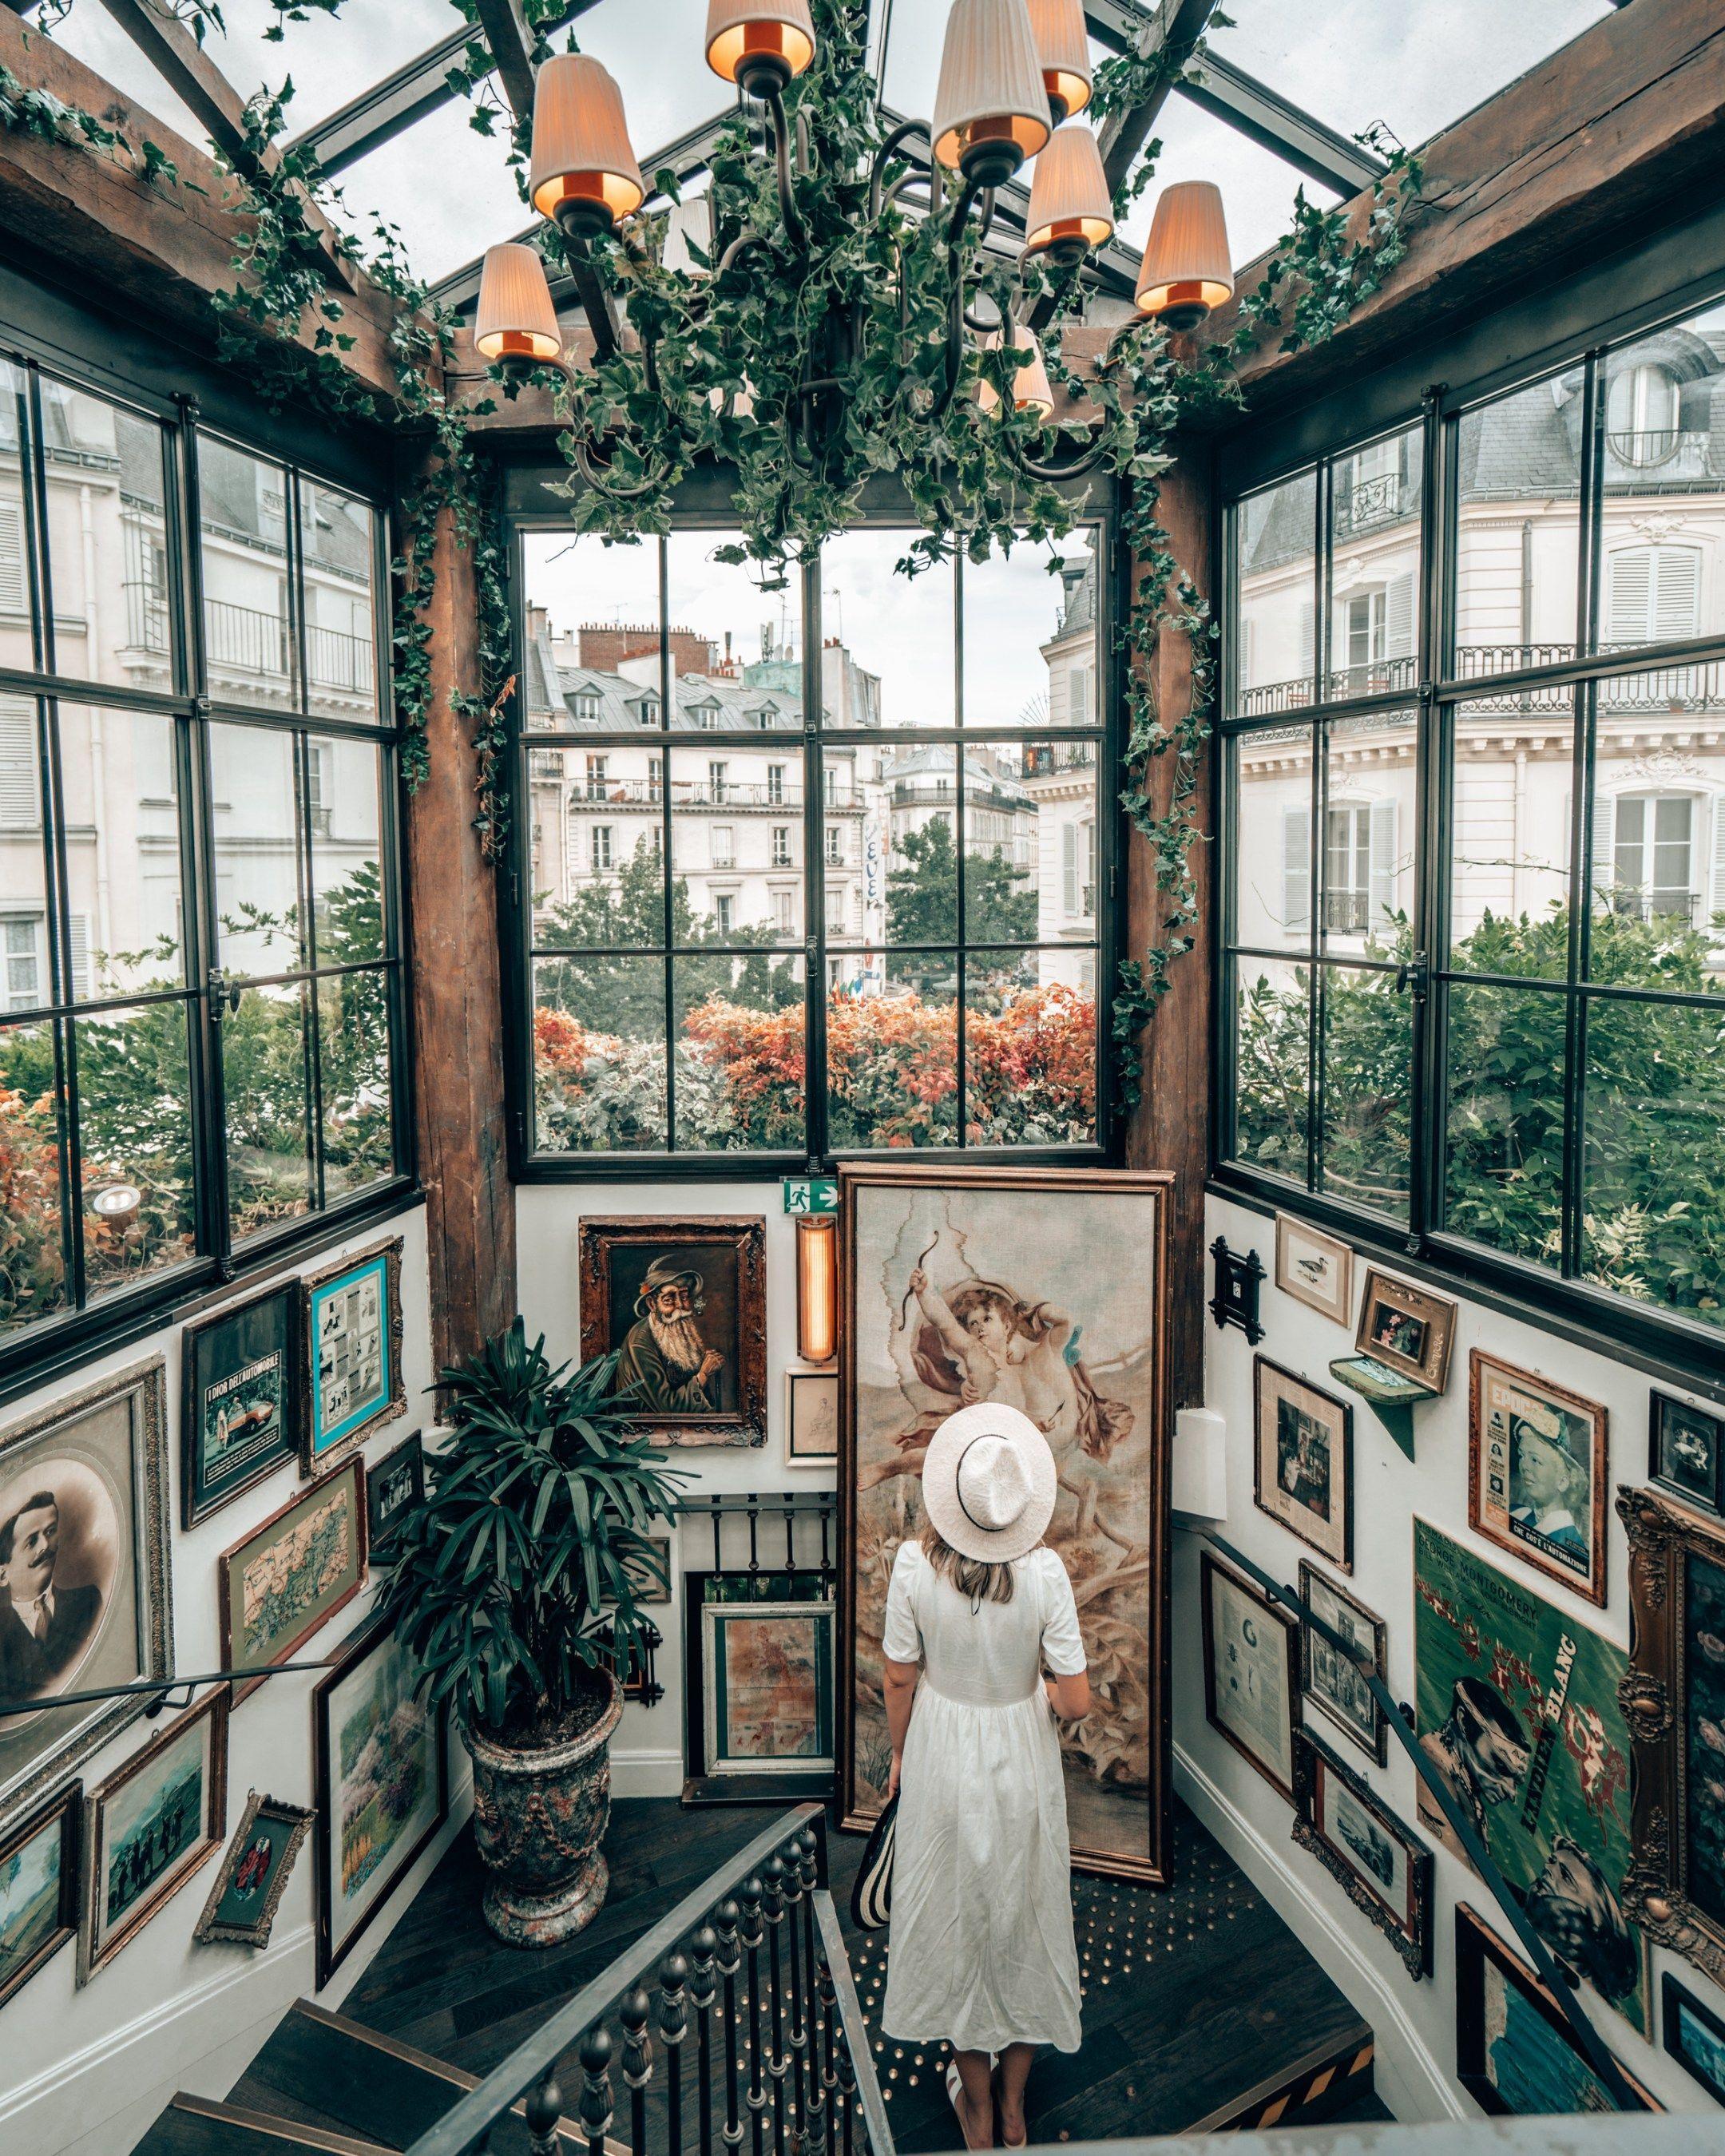 An Instagrammable Guide To Paris 20bis Rue de Douai 75009 Paris France #travelideas #summer #travel #ideas